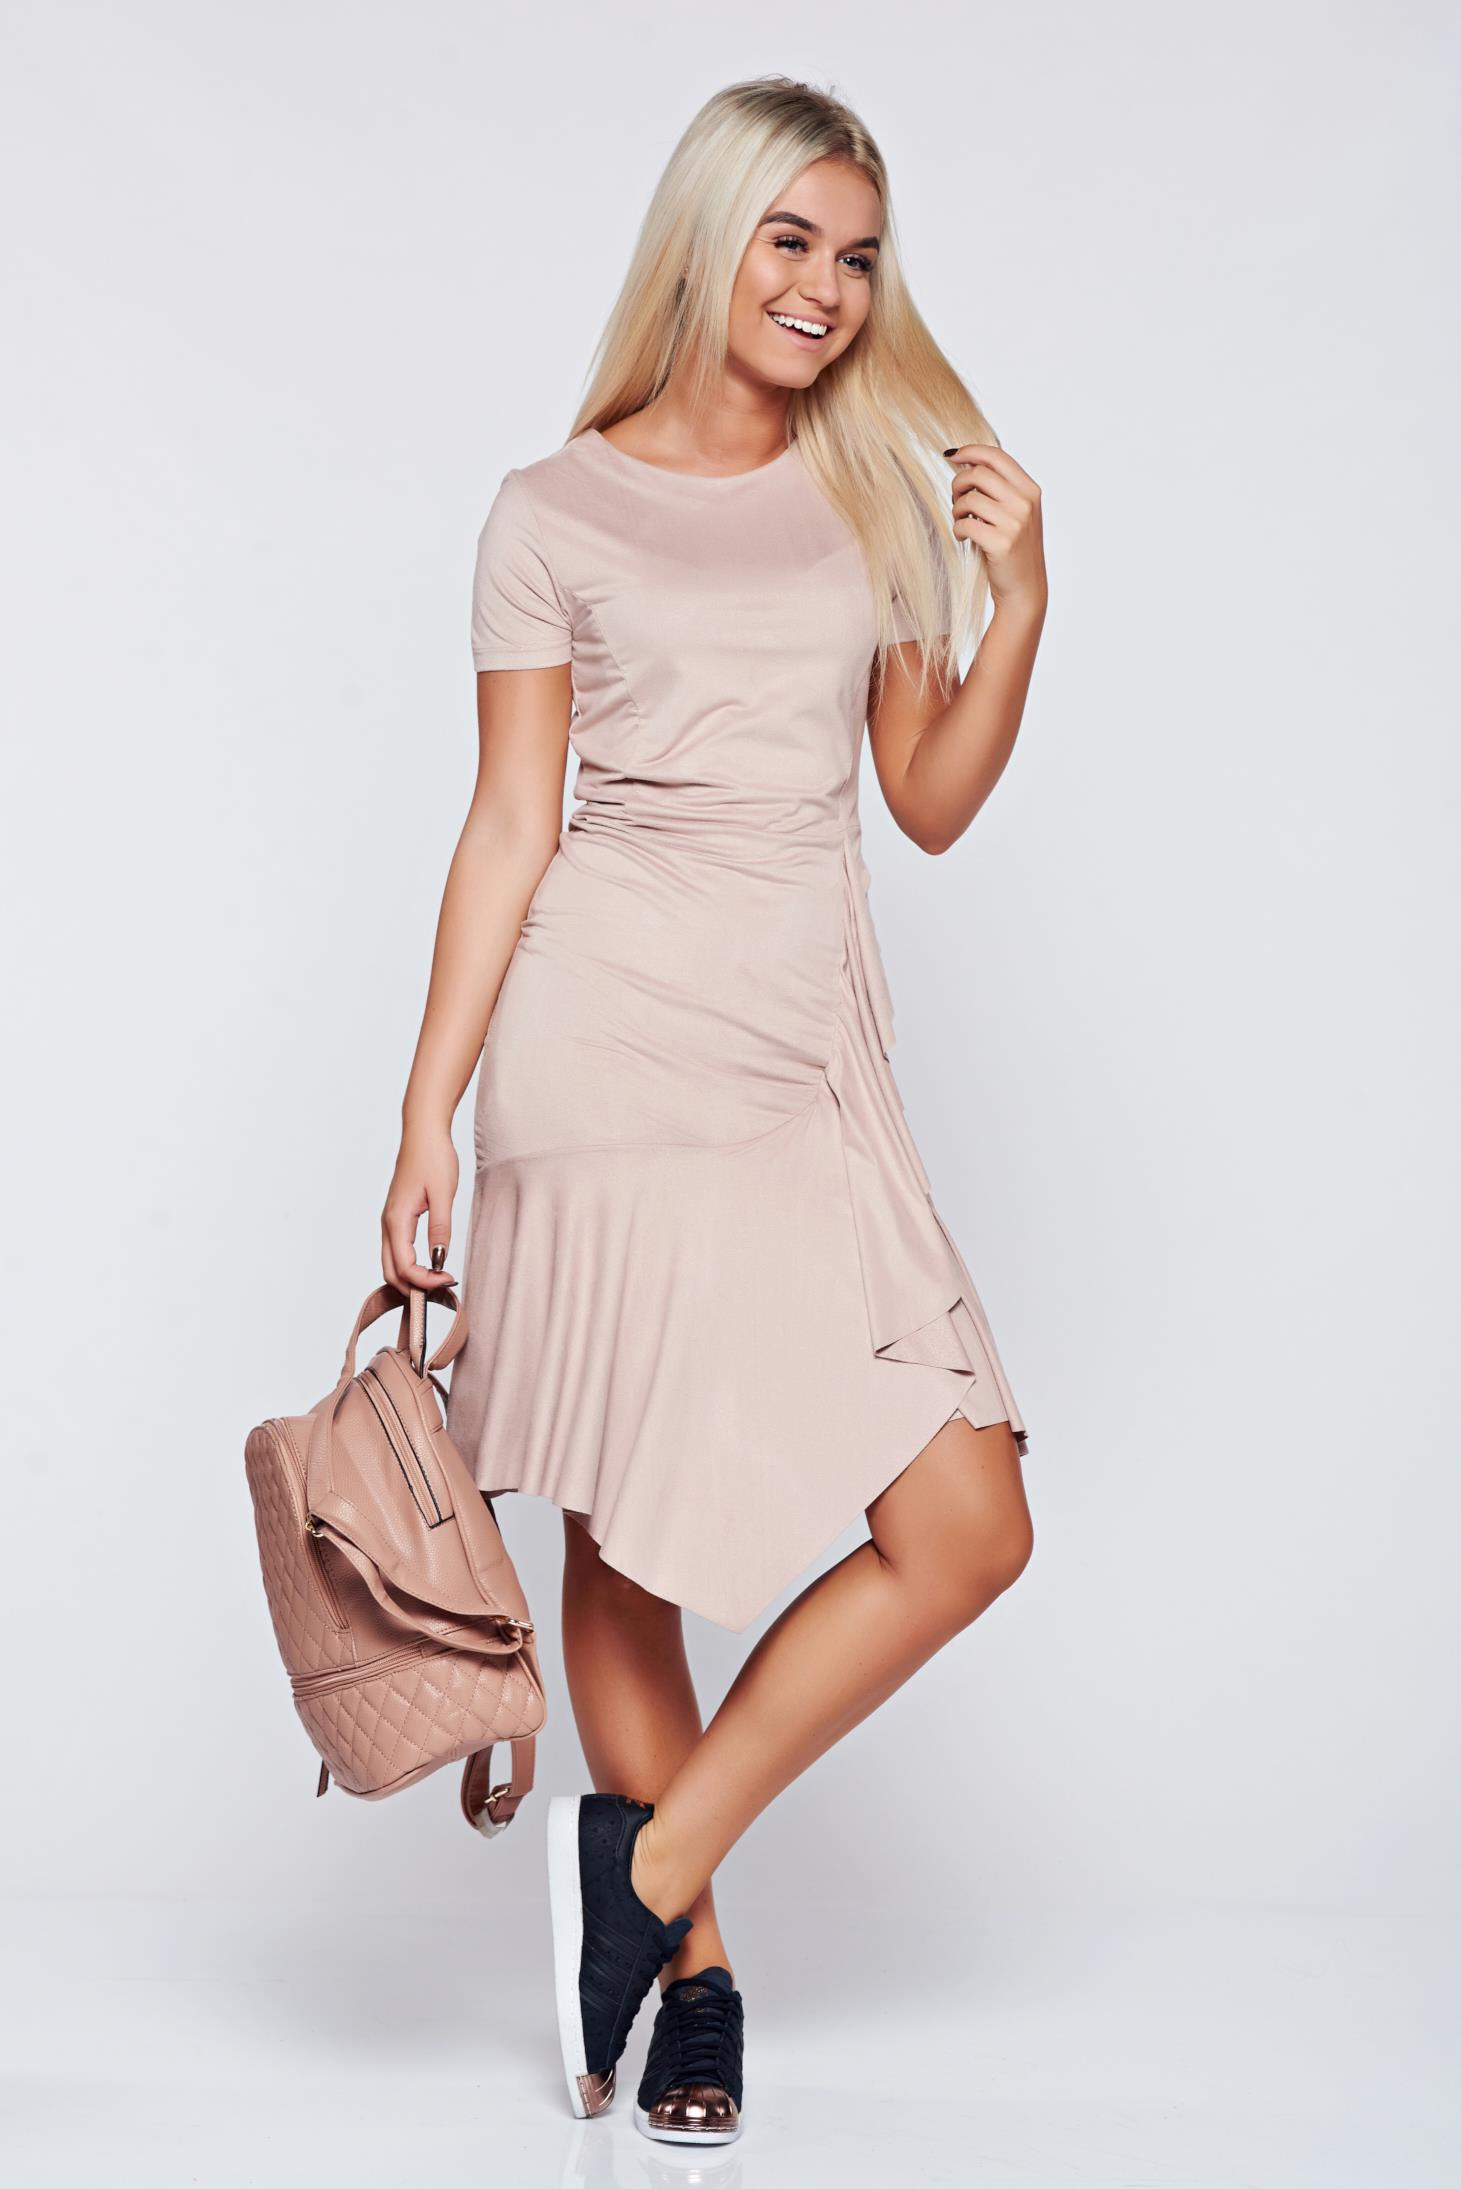 Rochie rosa din velur asimetrica cu volanase